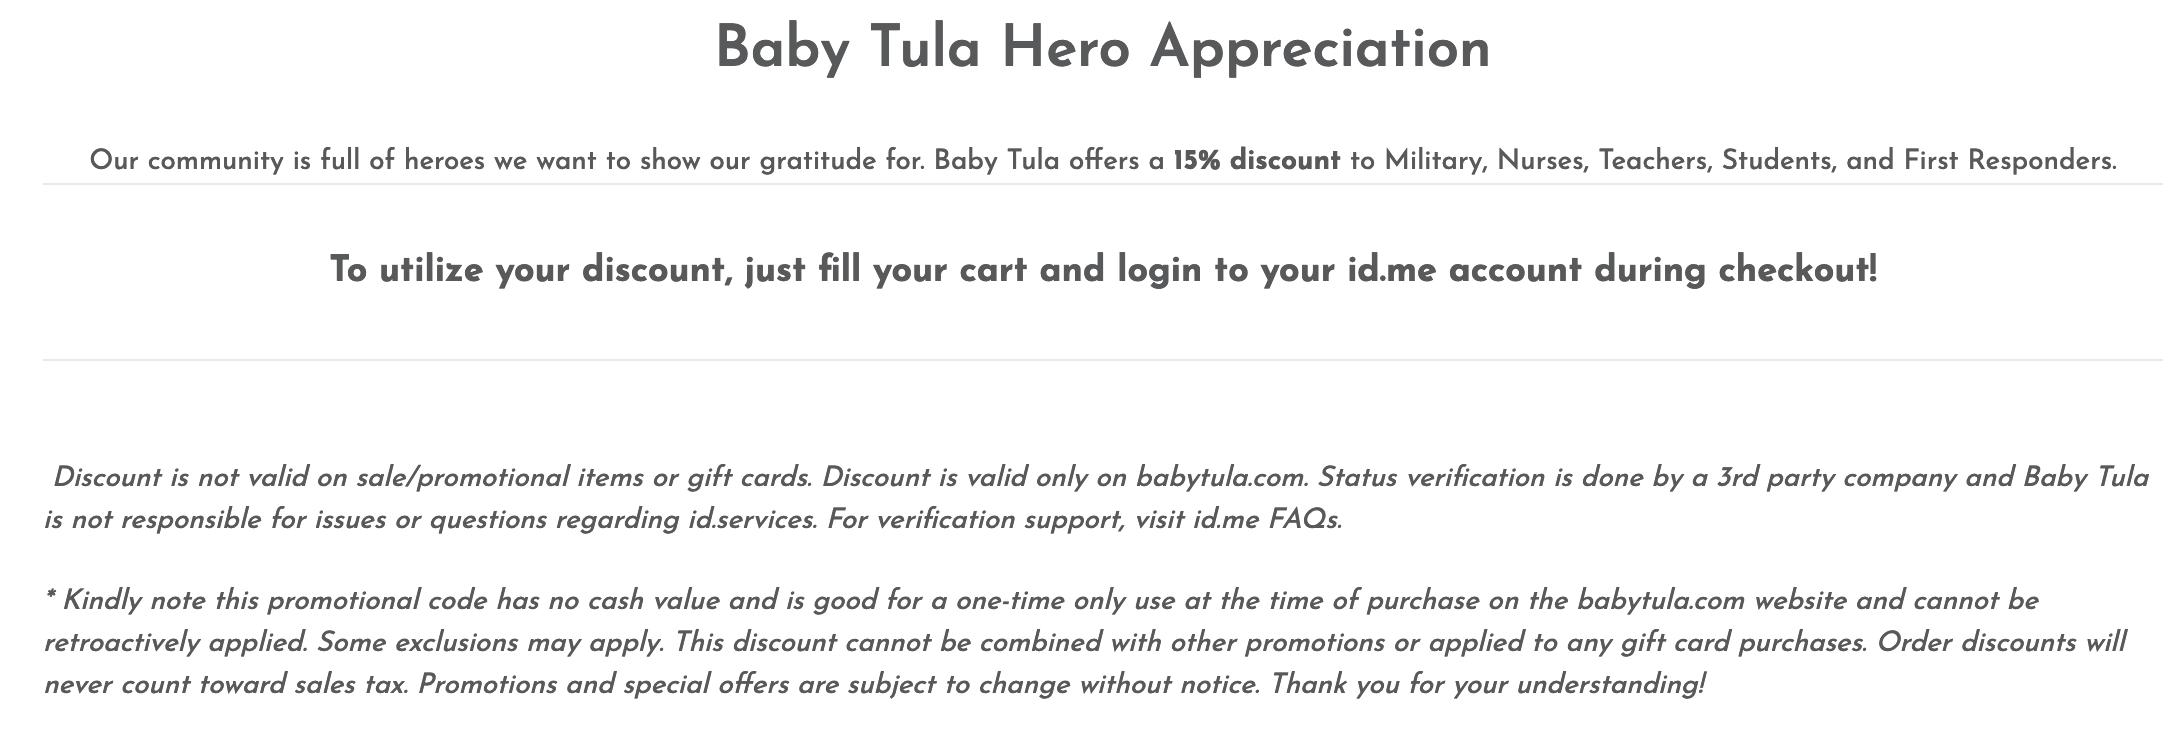 Baby Tula Military Veteran Discount